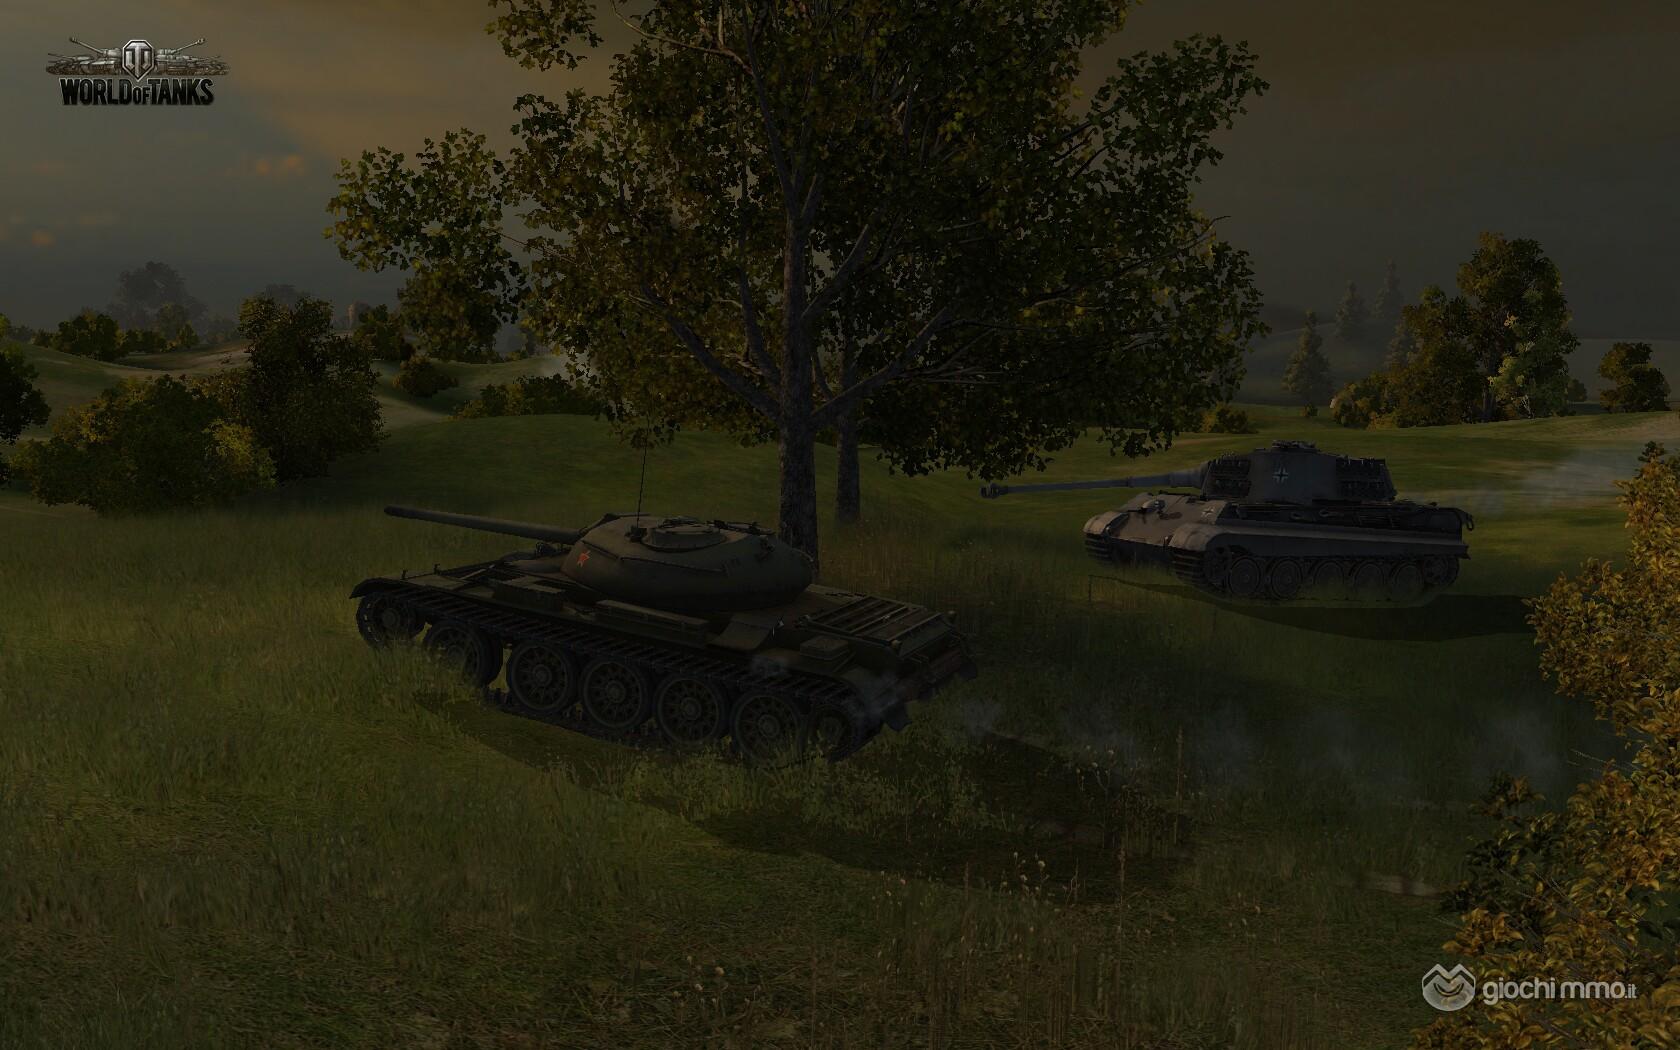 Clicca sull'immagine per ingrandirlaNome:   World of Tanks screen1.jpgVisite: 85Dimensione:   393.0 KBID: 8209